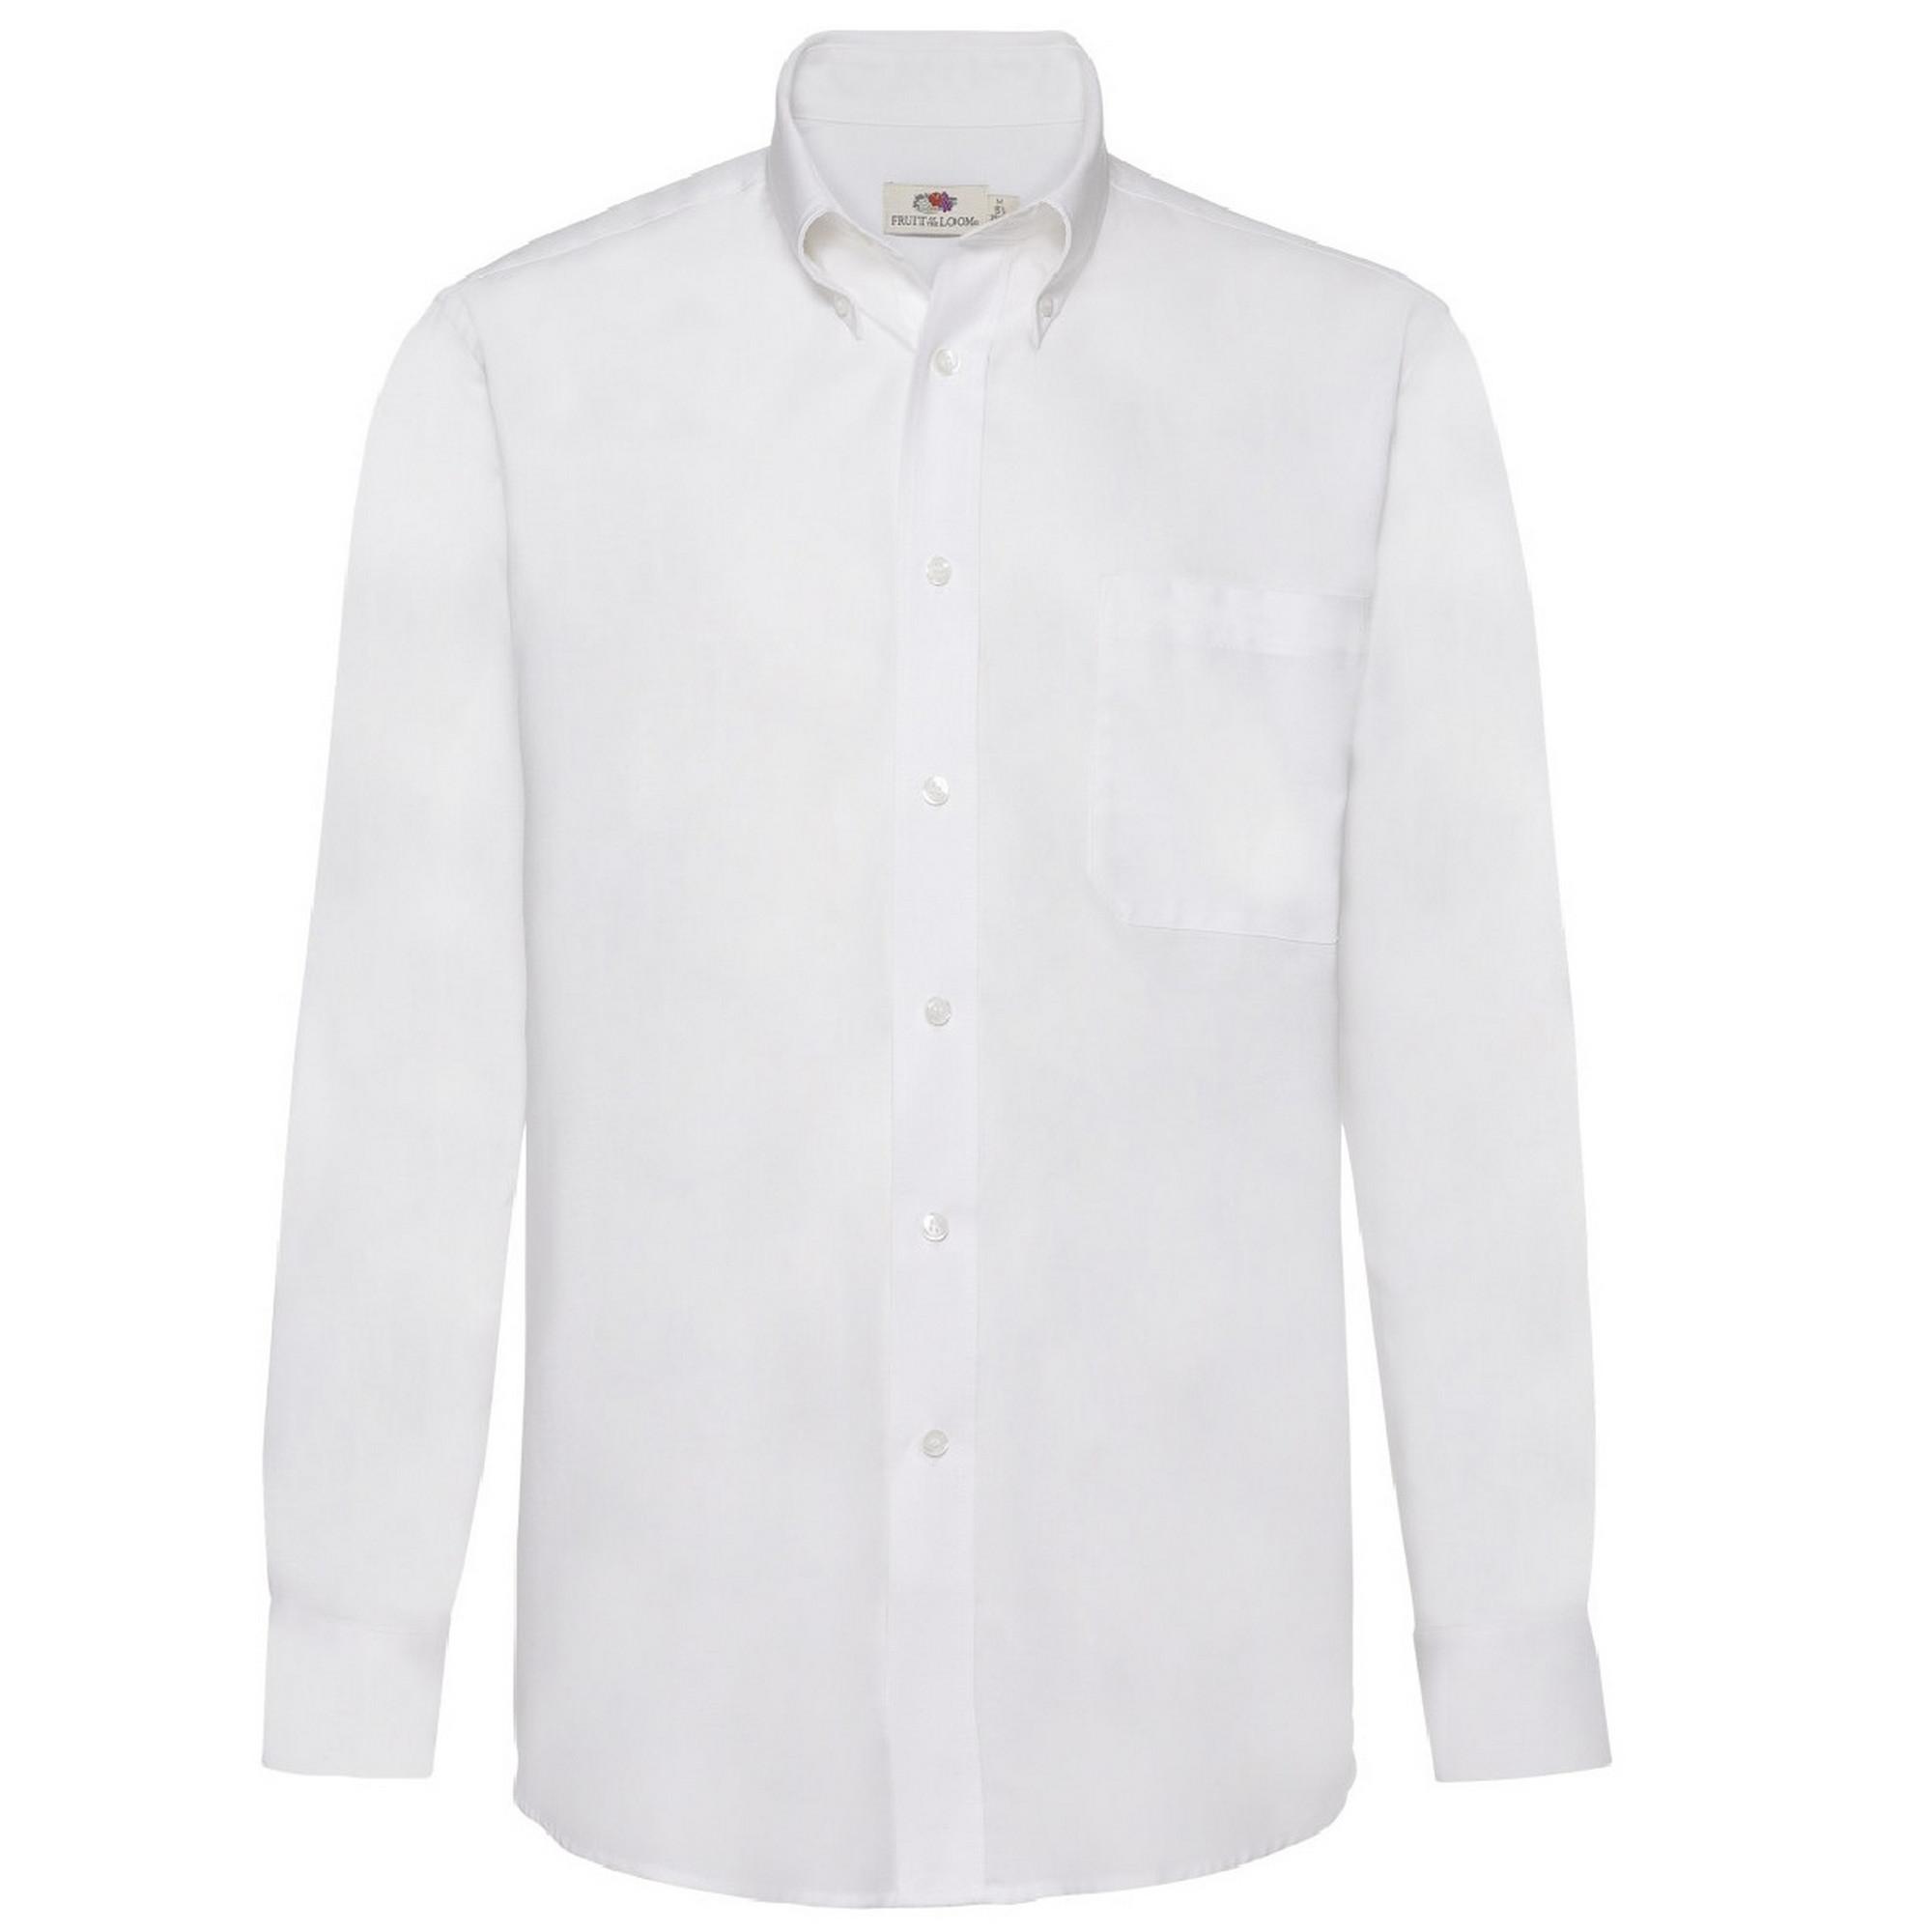 Fruit Of The Loom Mens Long Sleeve Oxford Shirt (M) (White)